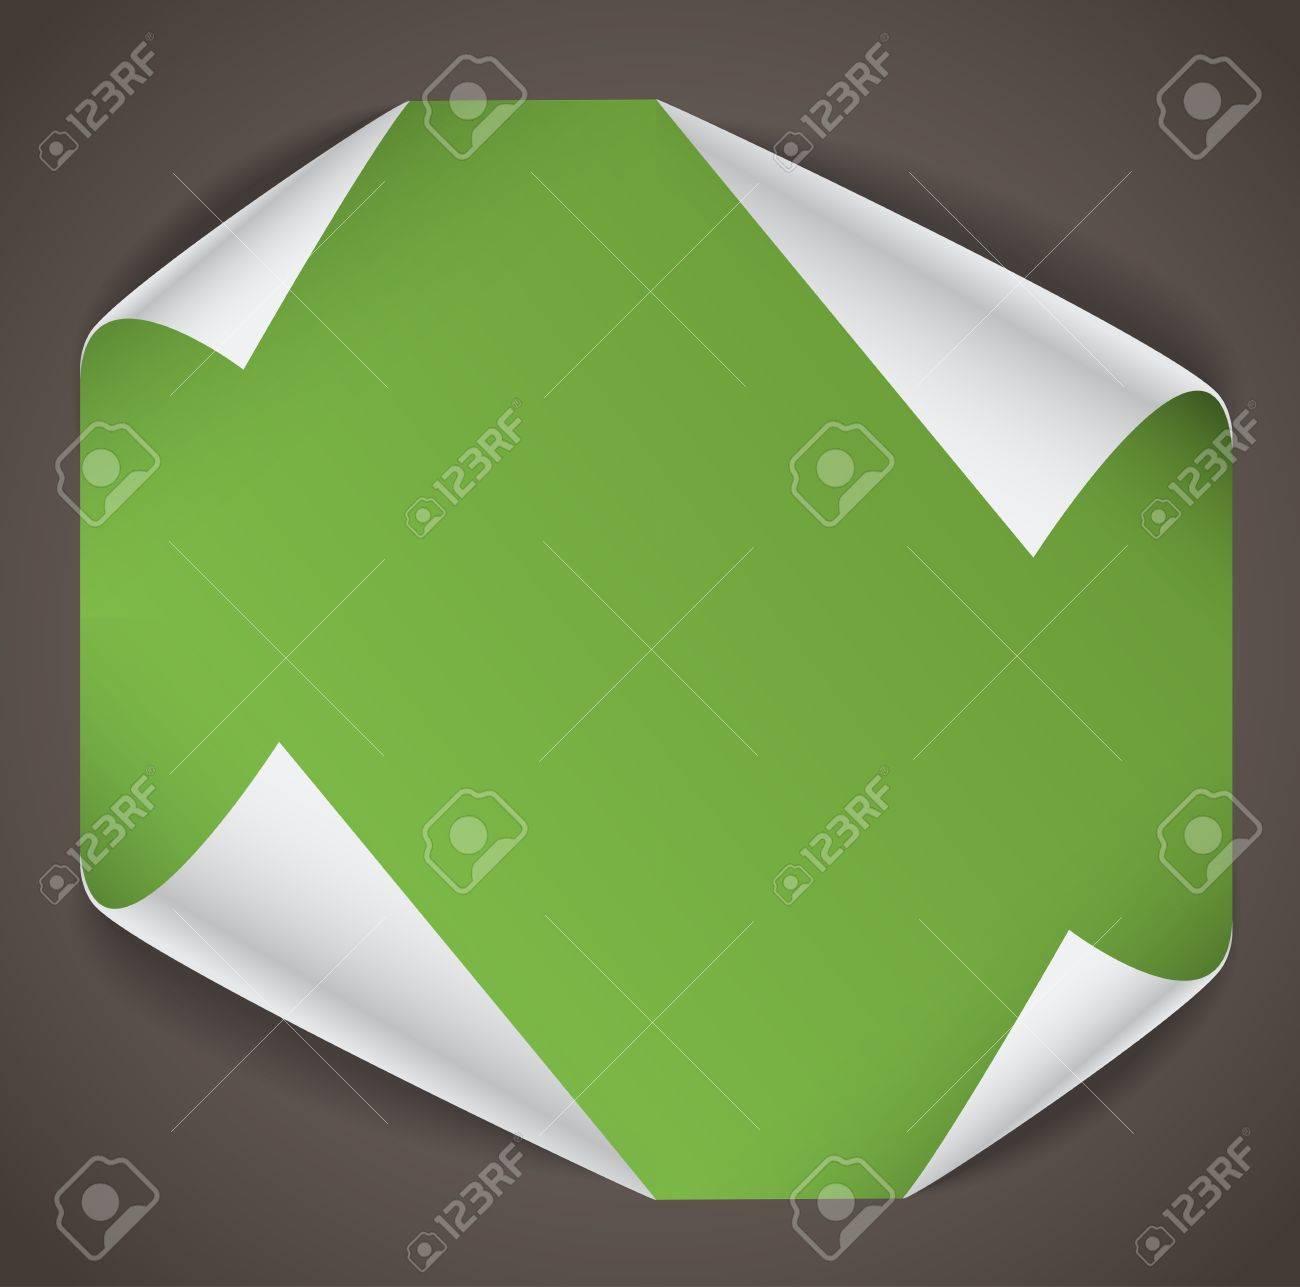 Blank paper sheet with bending corners Stock Vector - 12429152